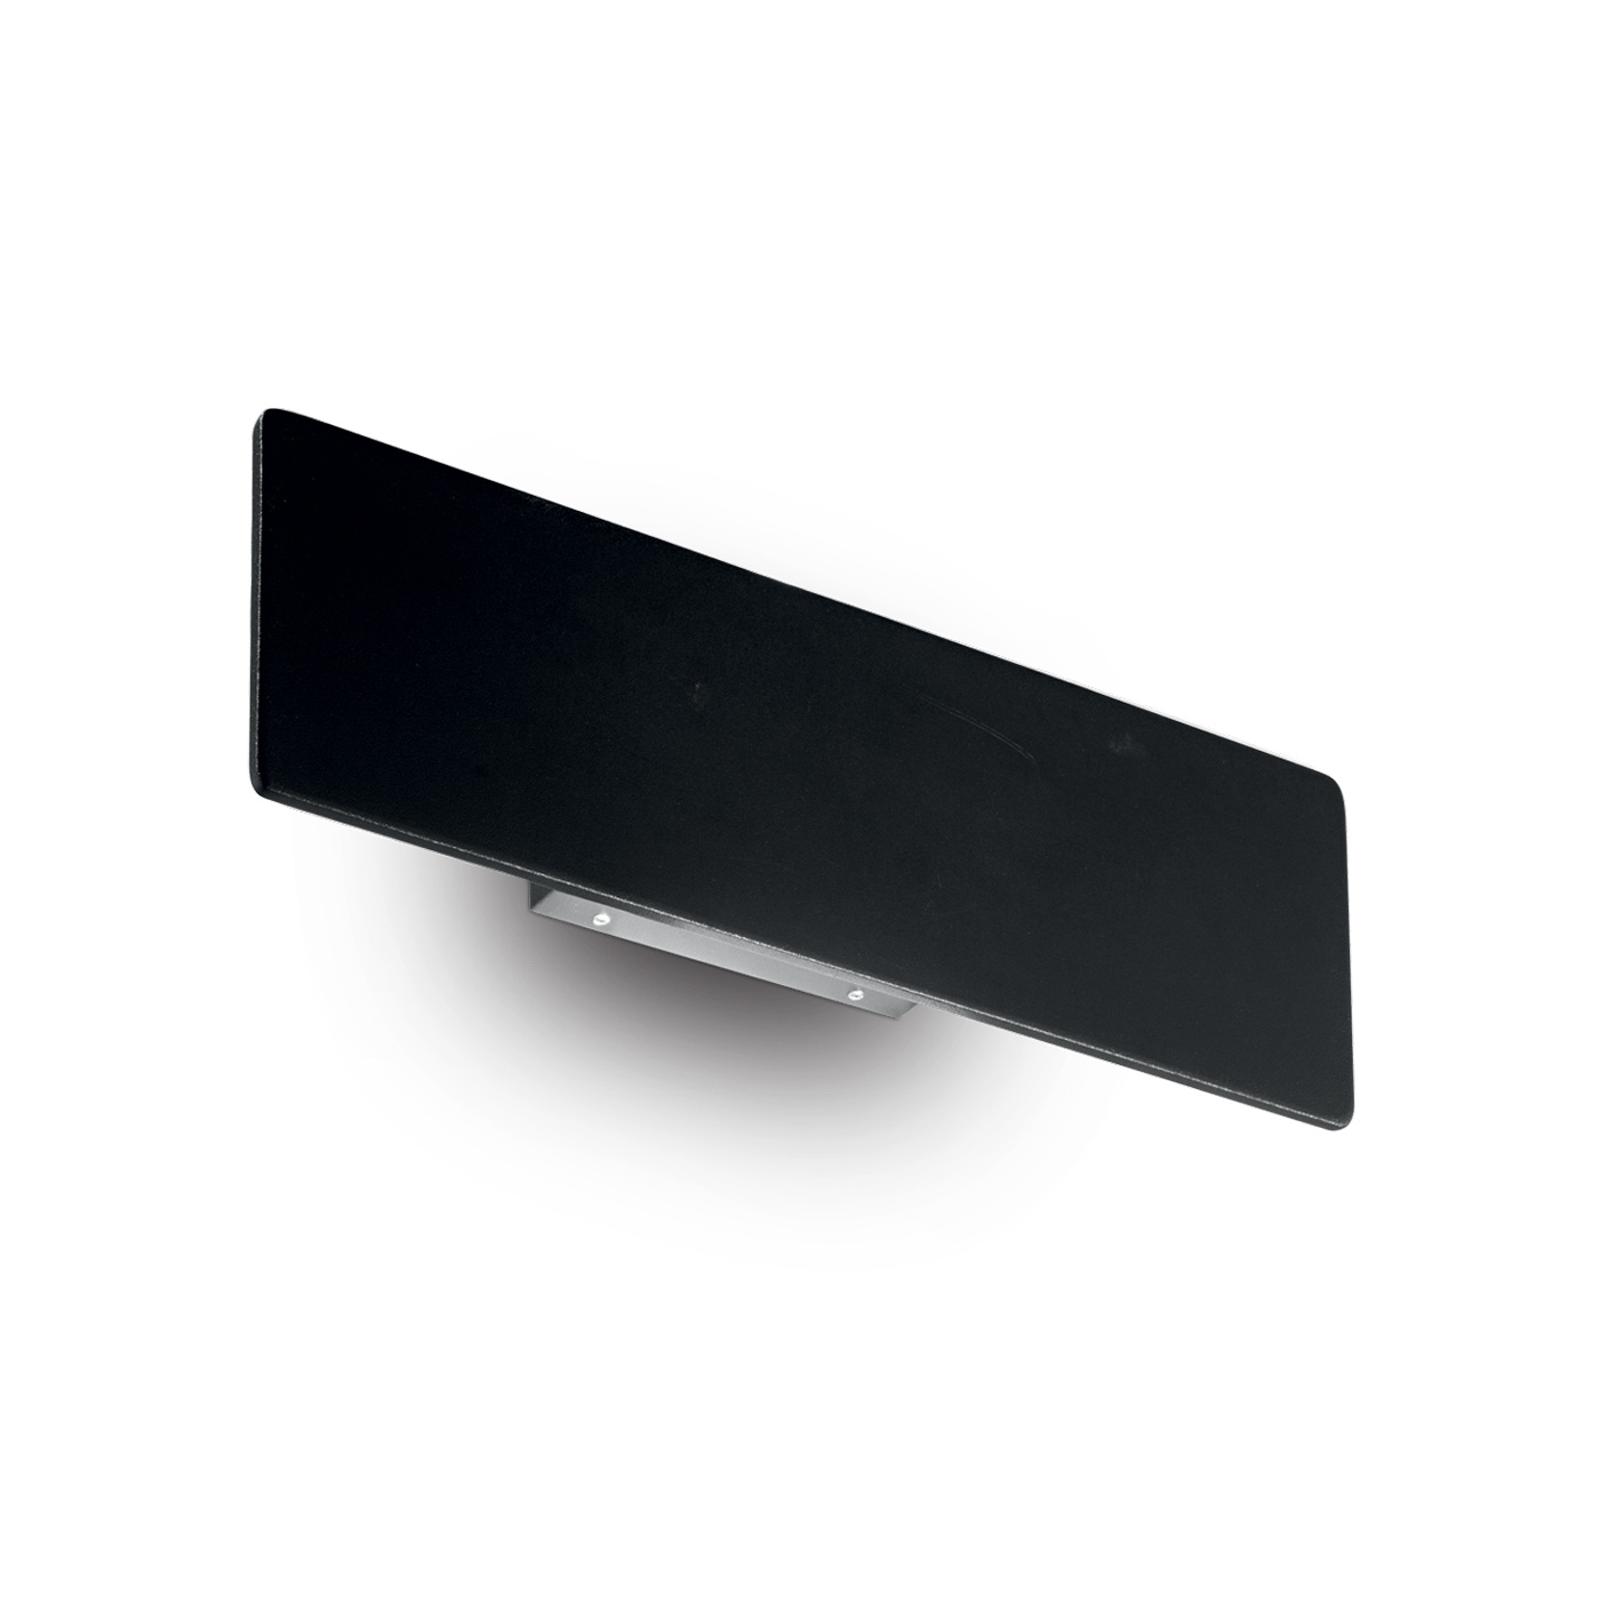 LED-seinävalaisin Zig Zag, musta, leveys 29 cm